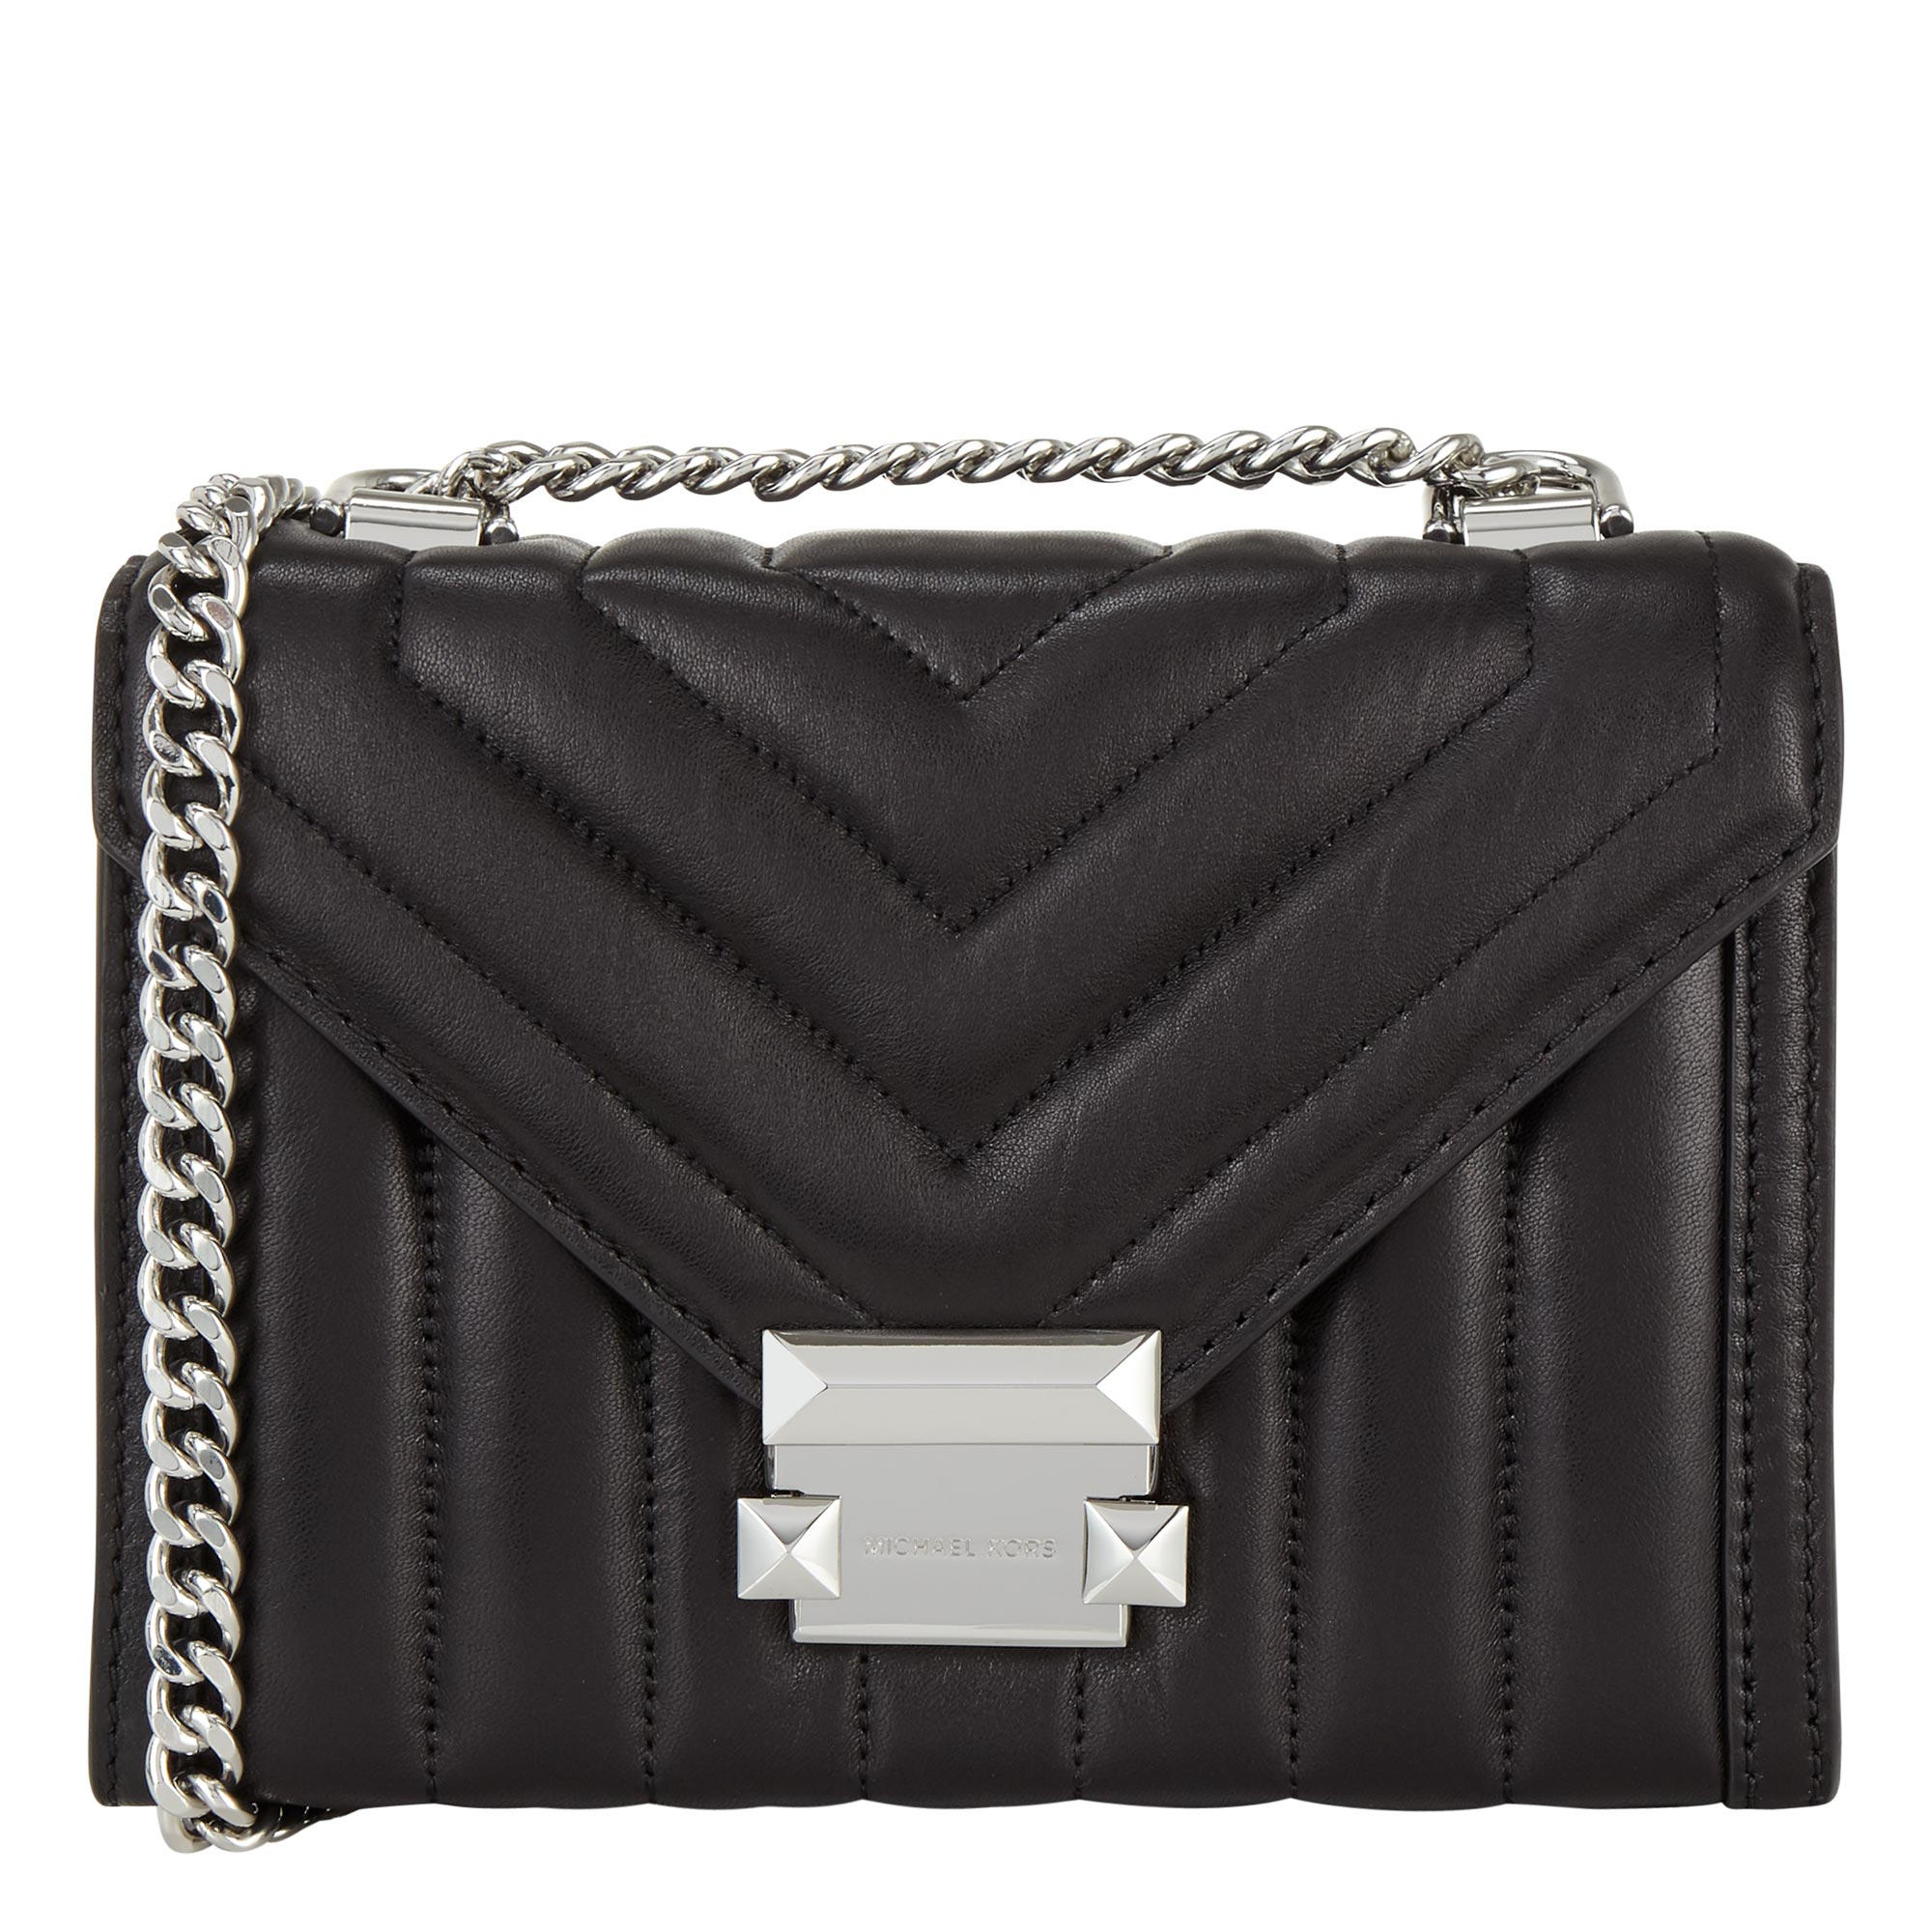 135221337: Whitney Small Shoulder Bag